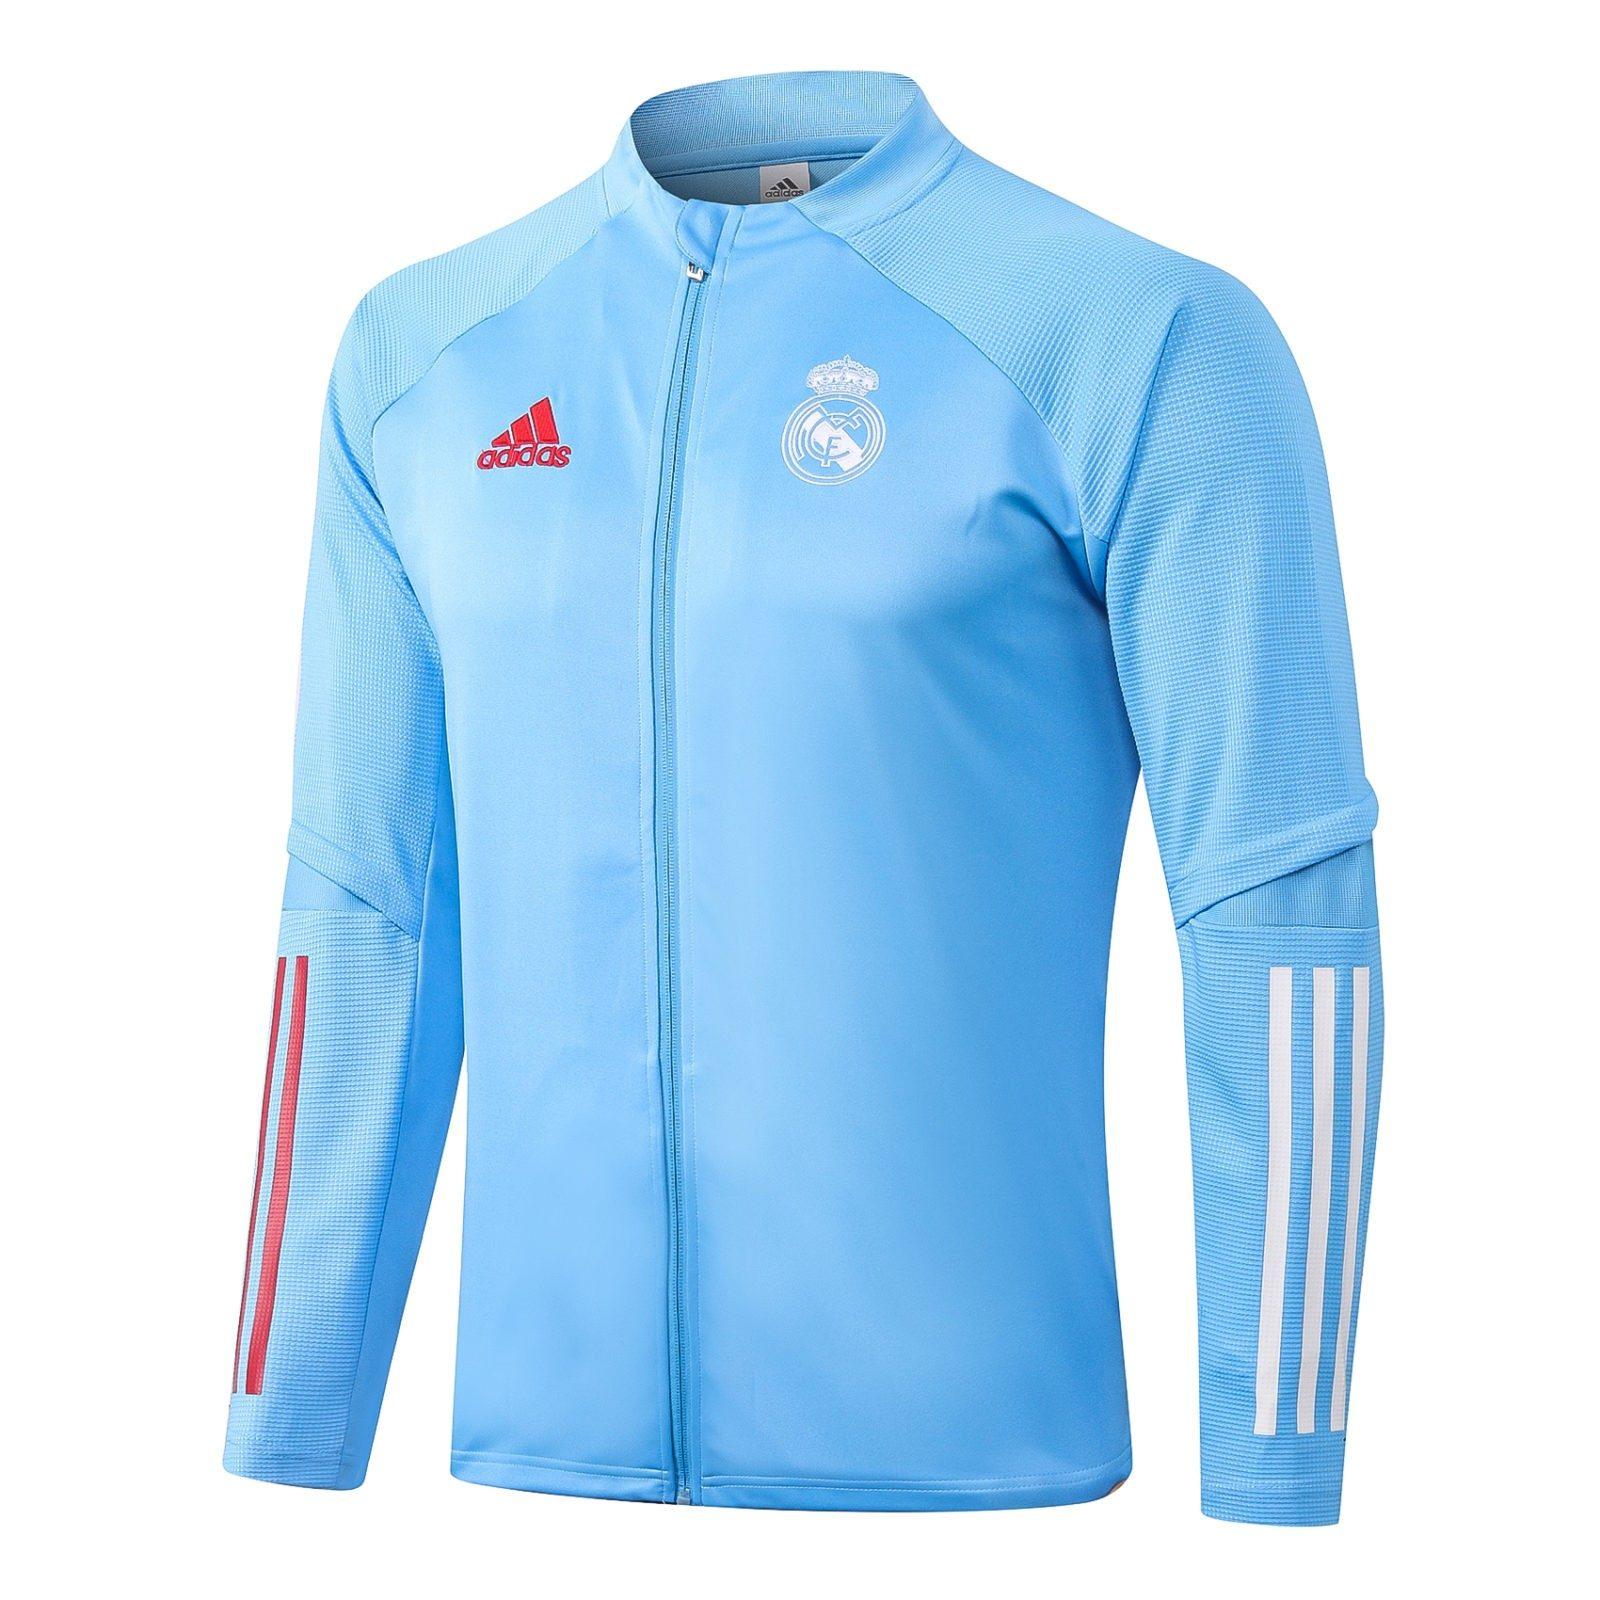 Олимпийка Реал Мадрид сезон 2020-2021 (Голубая)